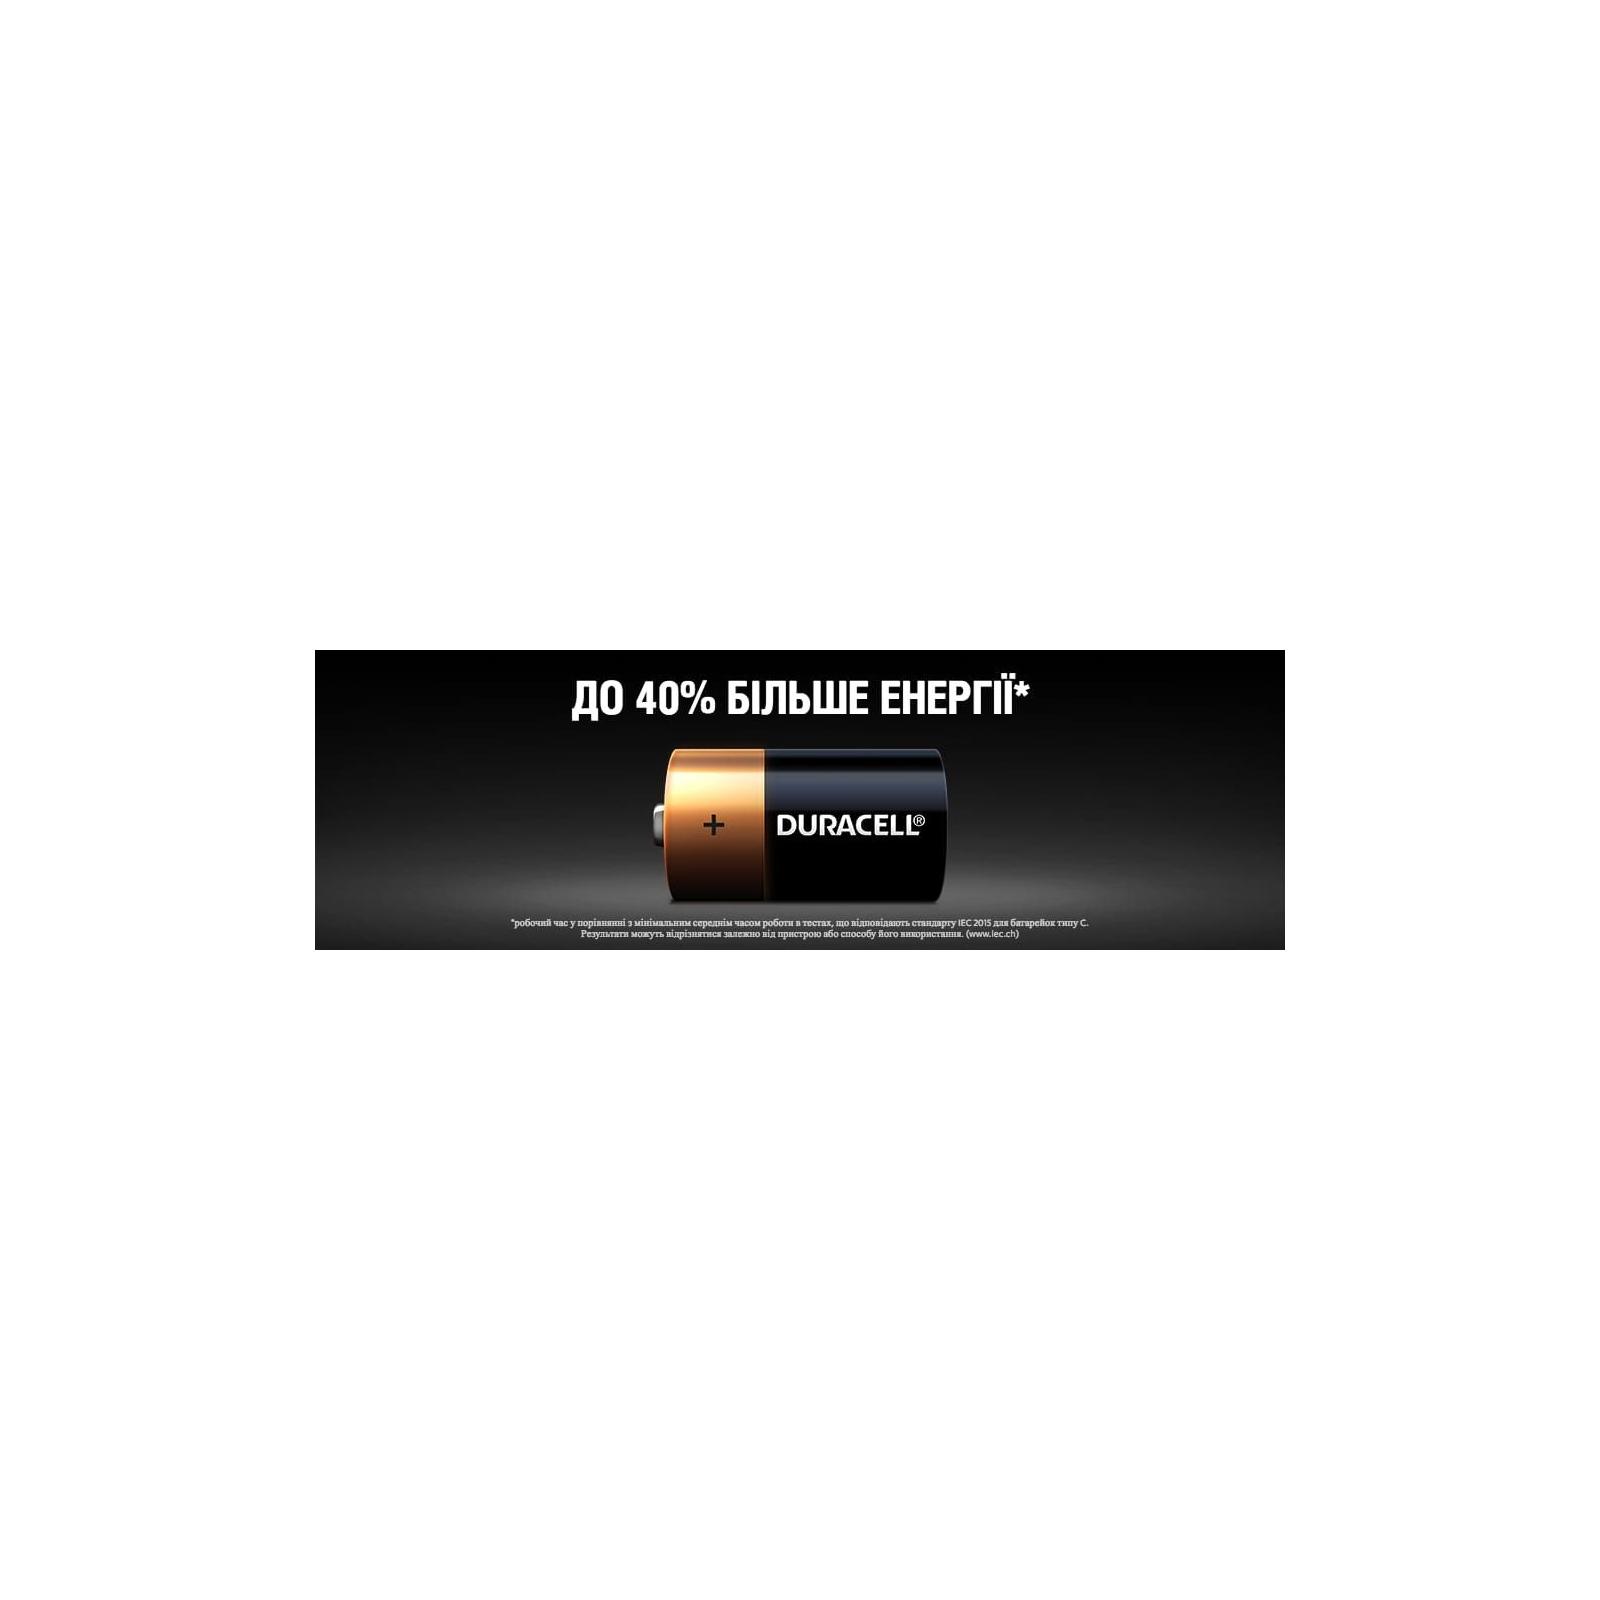 Батарейка Duracell C LR14 * 2 (5000394052529 / 81483545) изображение 7